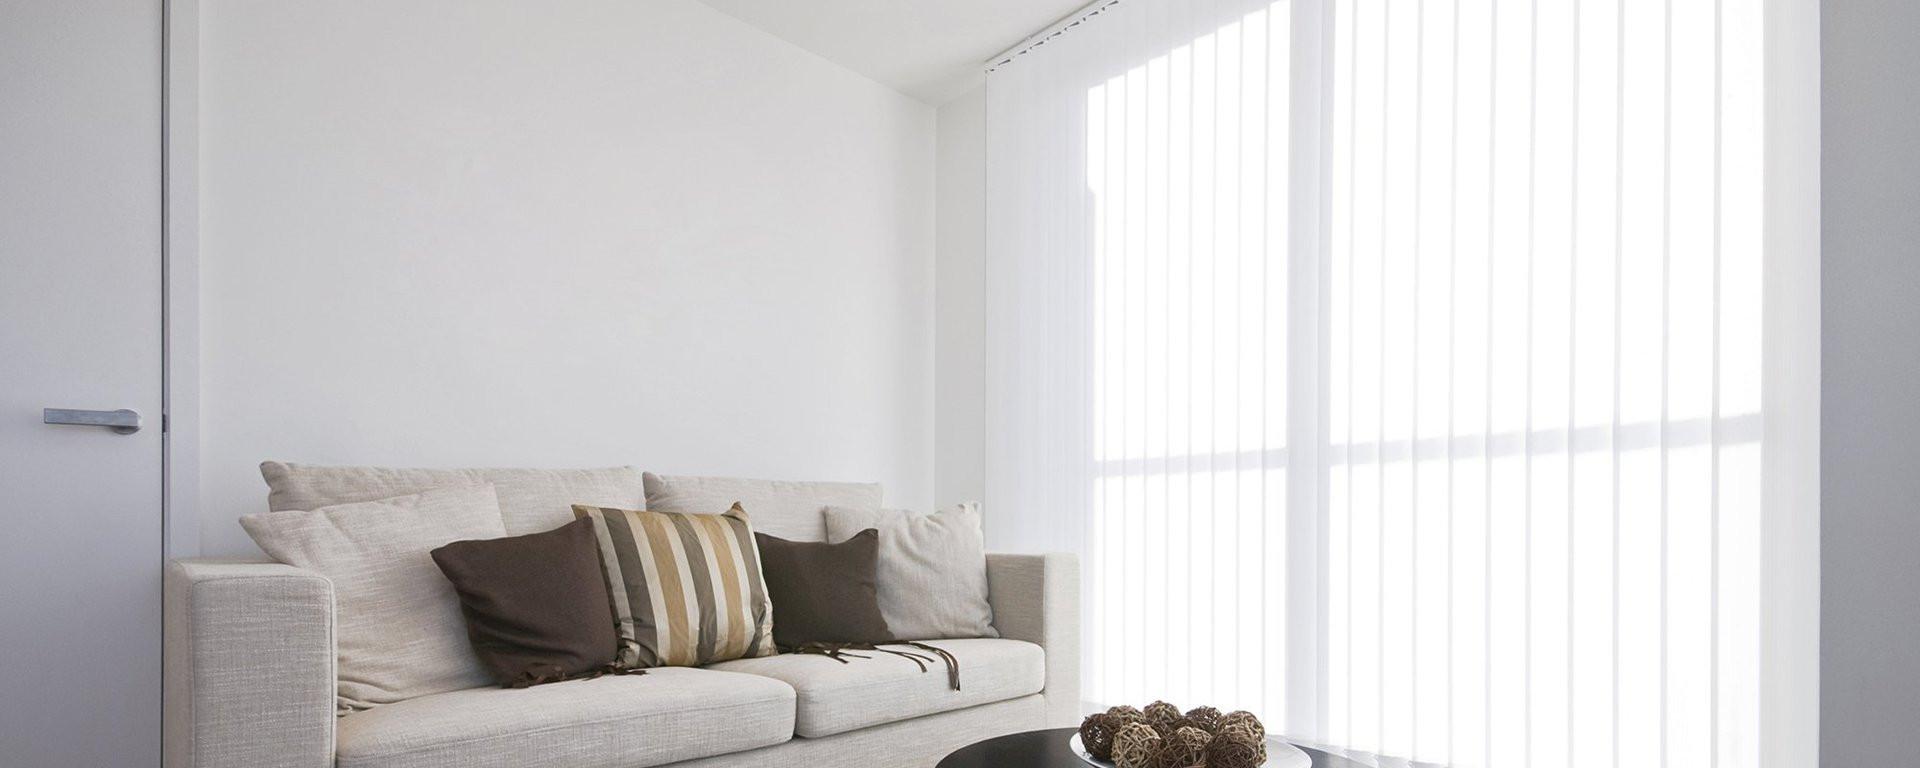 Curtain villa.jpeg